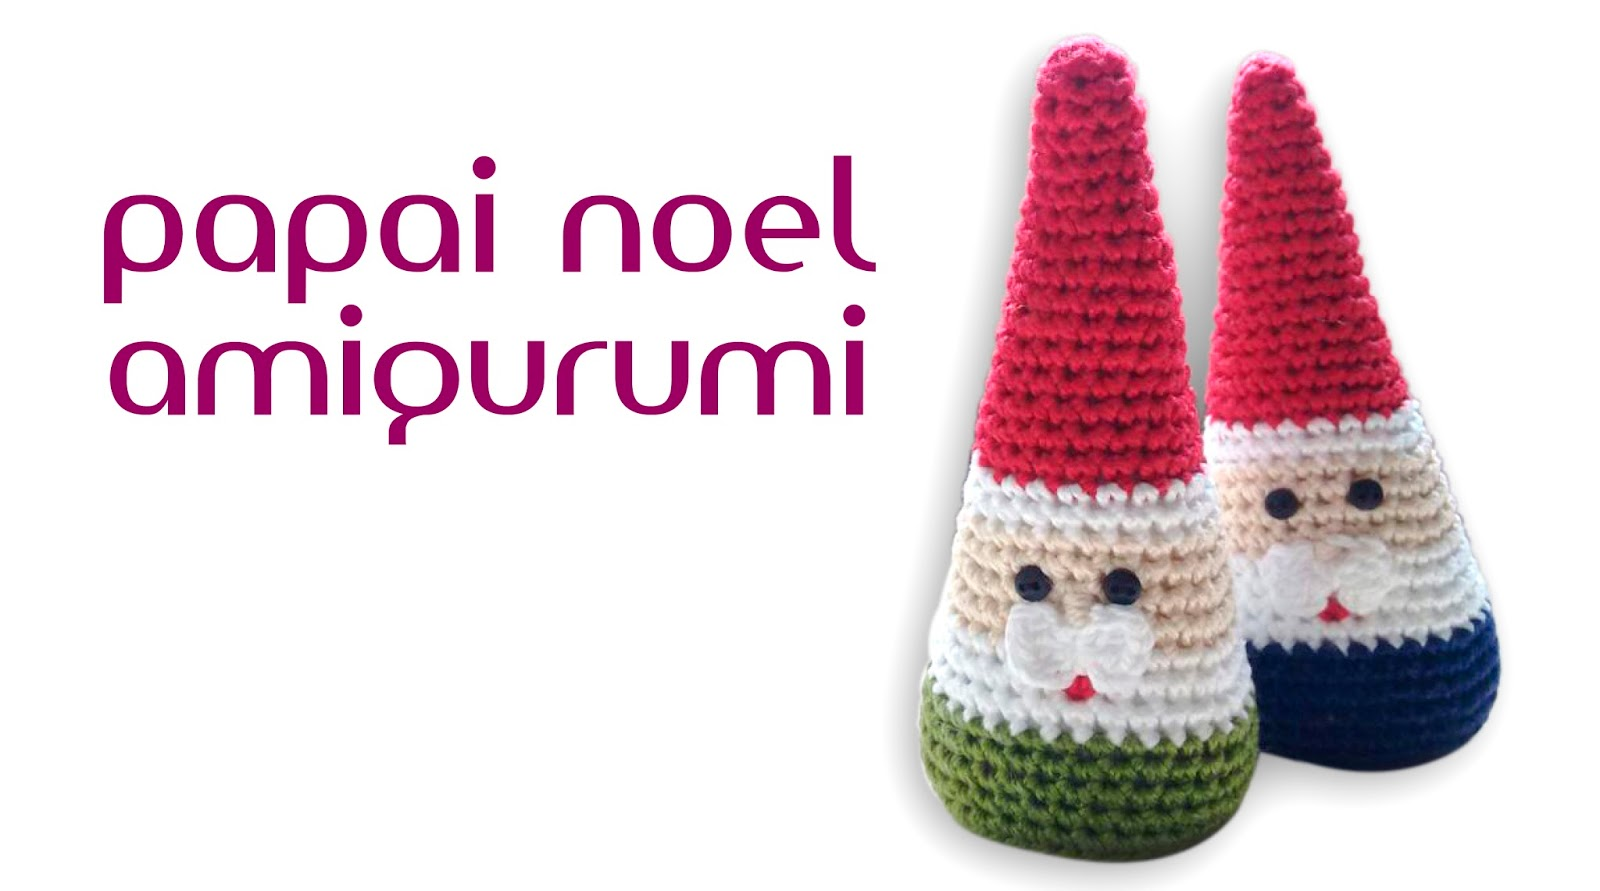 AMIGURUMI XÍCARA PORTA AGULHAS | Presentes de crochê, Almofadas de ... | 891x1600